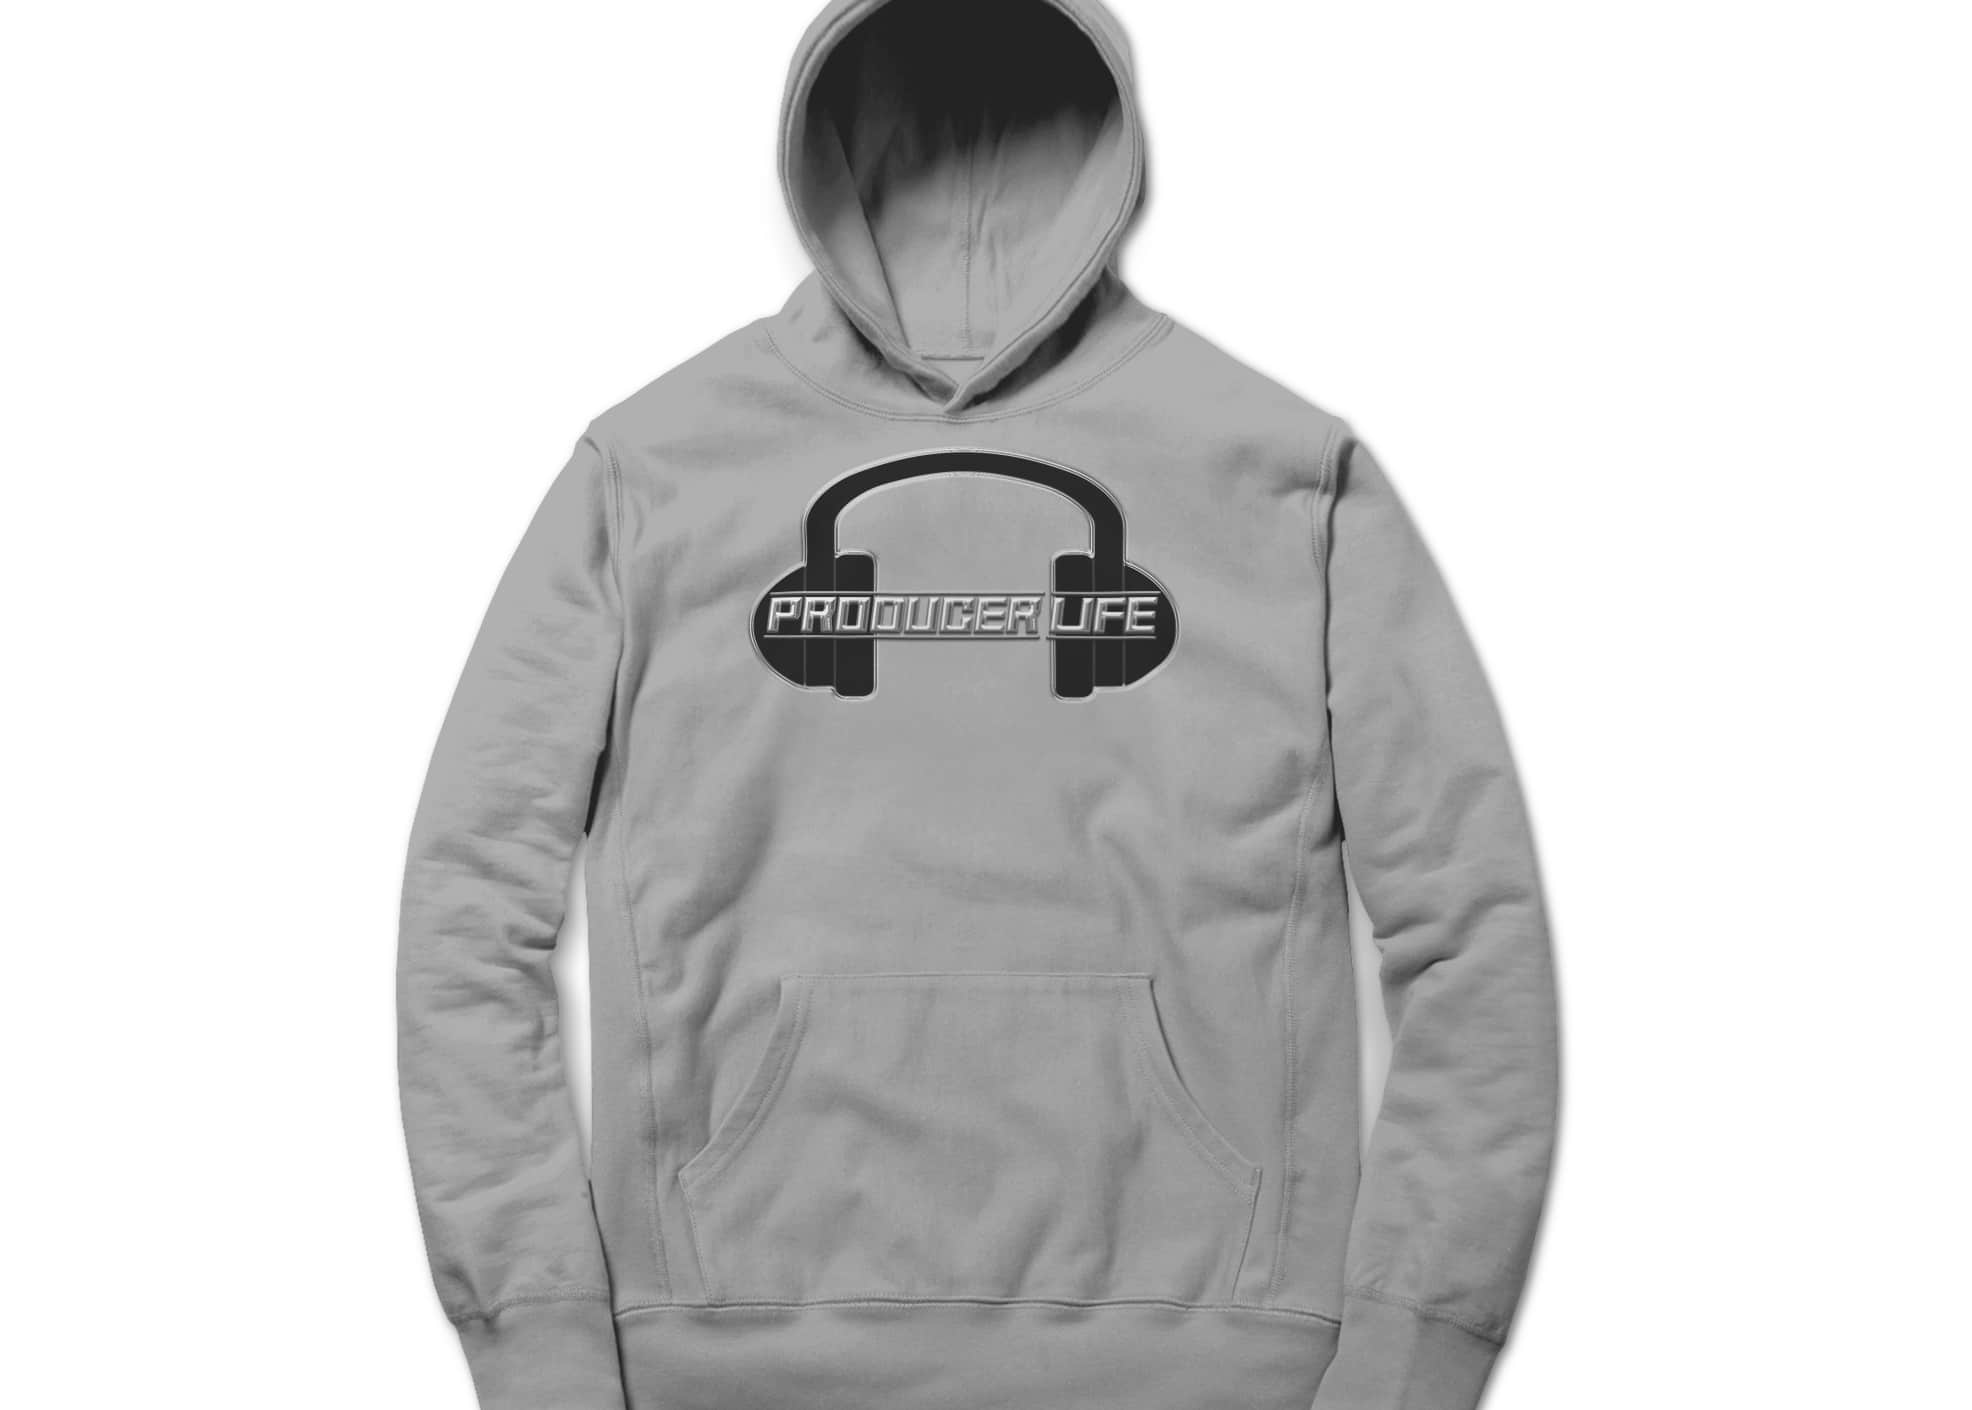 Tmsd  producerlife  limited edition chrome  black 1594418285